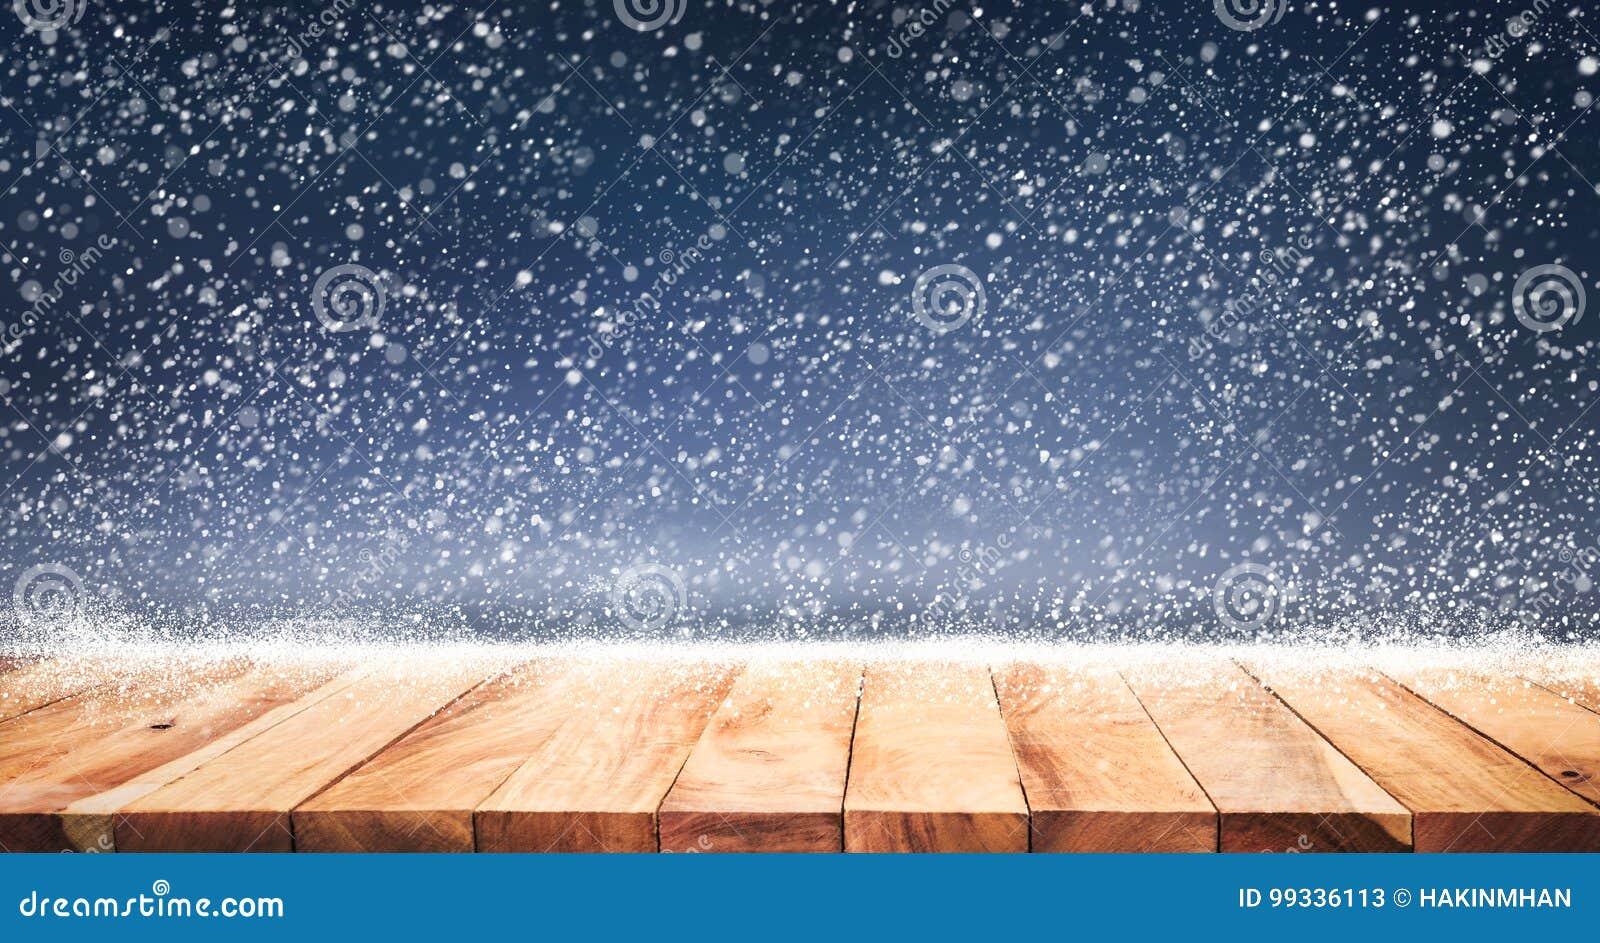 Wood table top with snowfall of winter season background.christmas